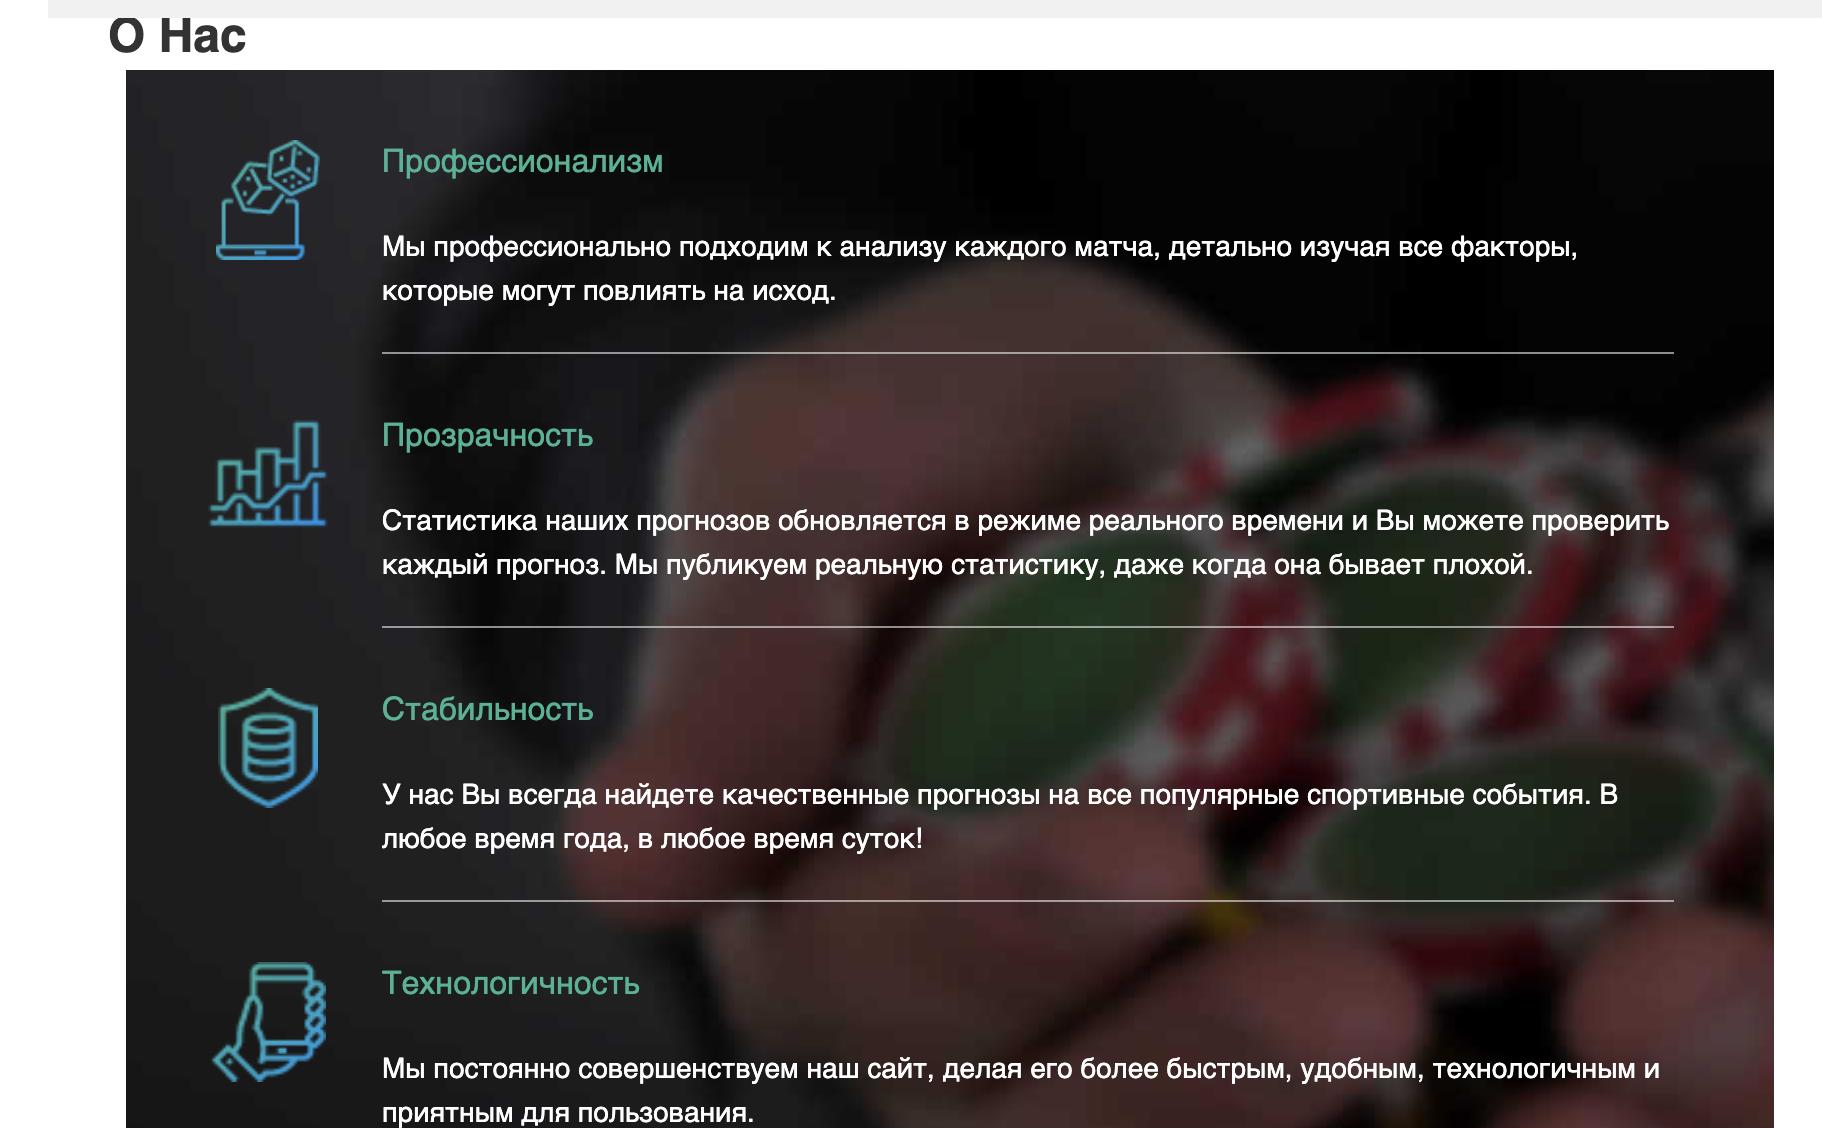 О нас на сайте Vseprosport (Всепроспорт)